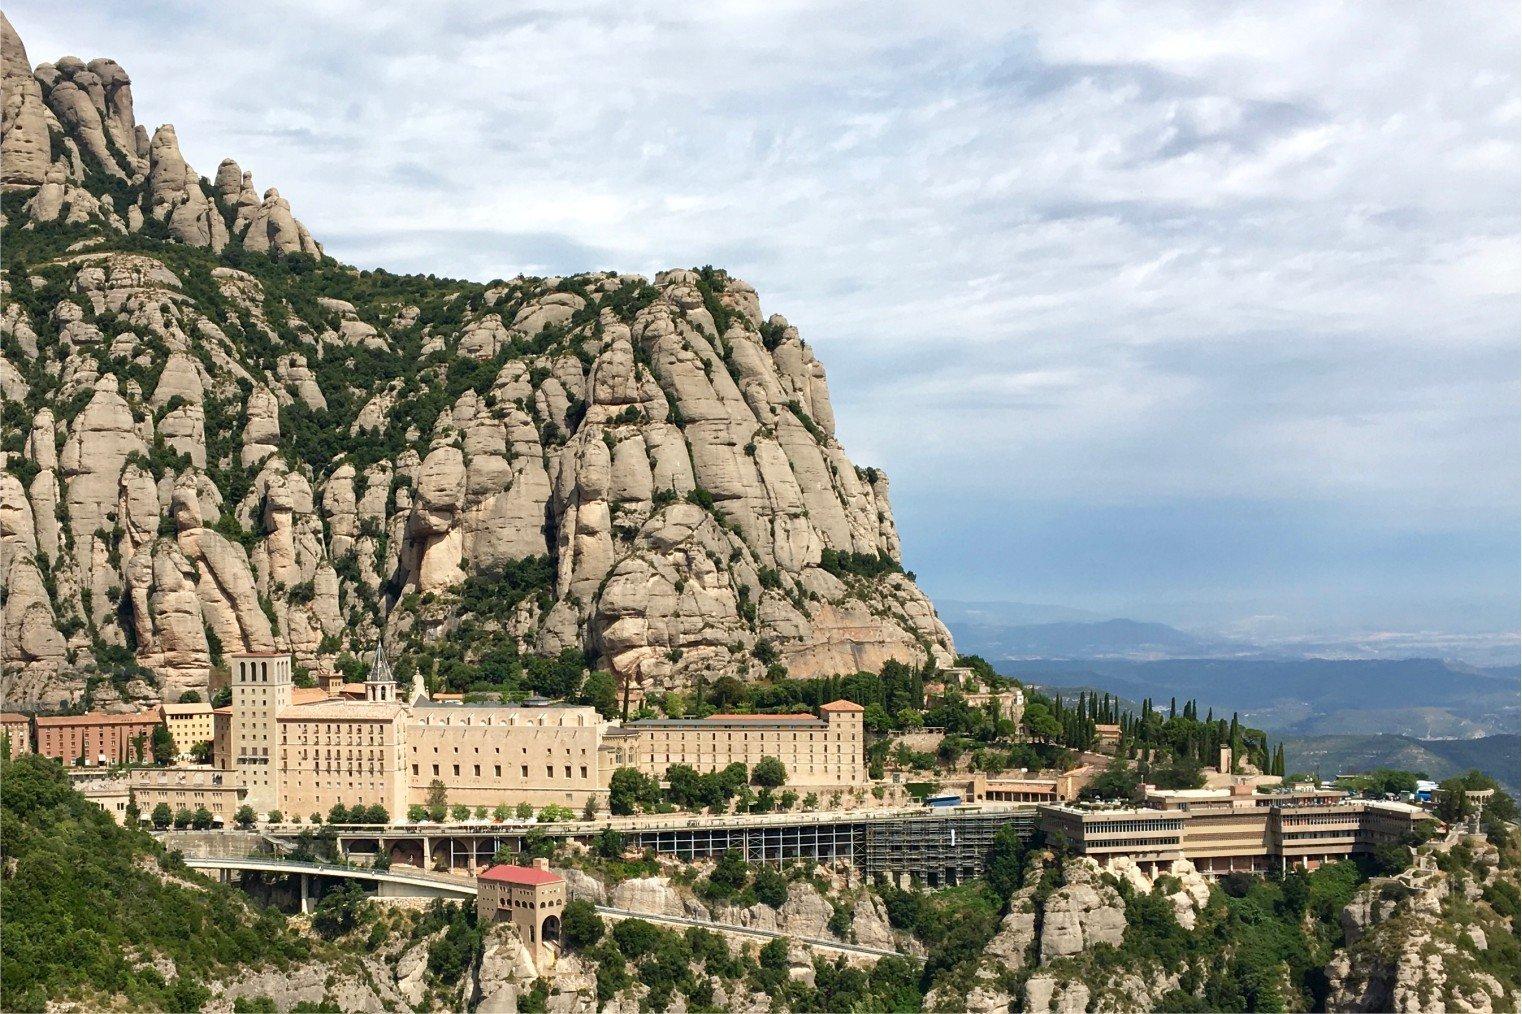 Santa Maria de Montserrat Abbey. Монастырь Монсеррат. Испания.